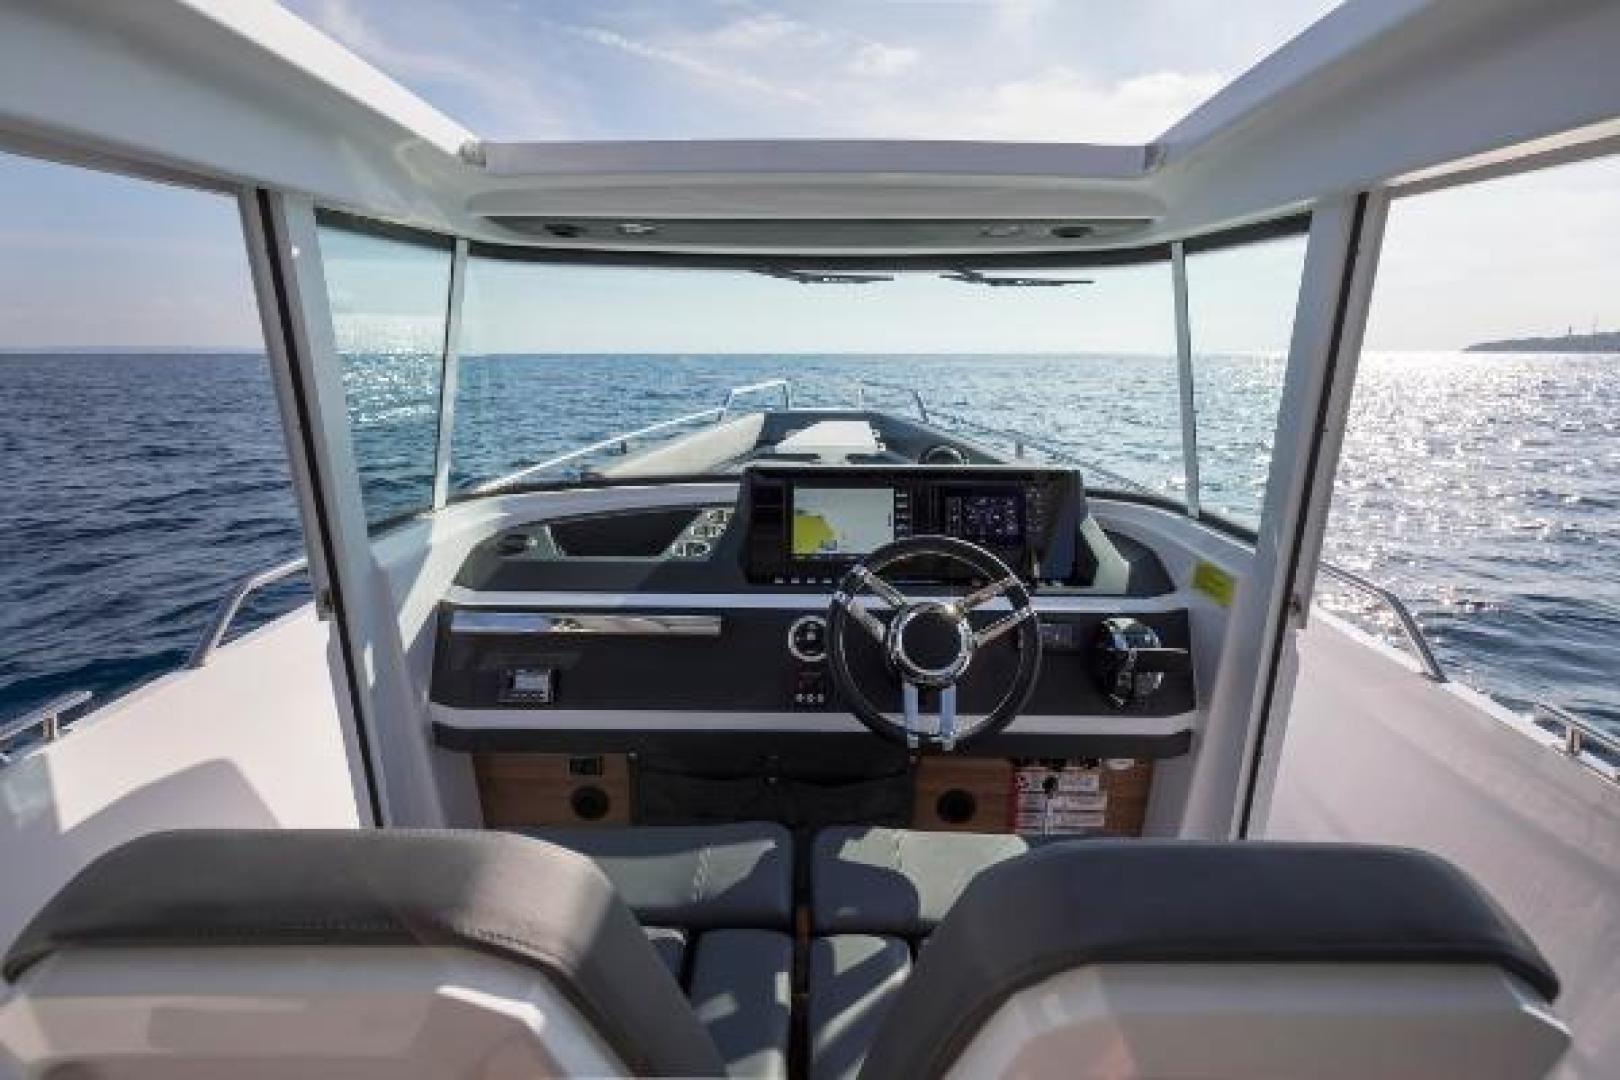 Axopar-28 CABIN 2020-Axopar 28 CABIN Fort Lauderdale-Florida-United States-1531321 | Thumbnail